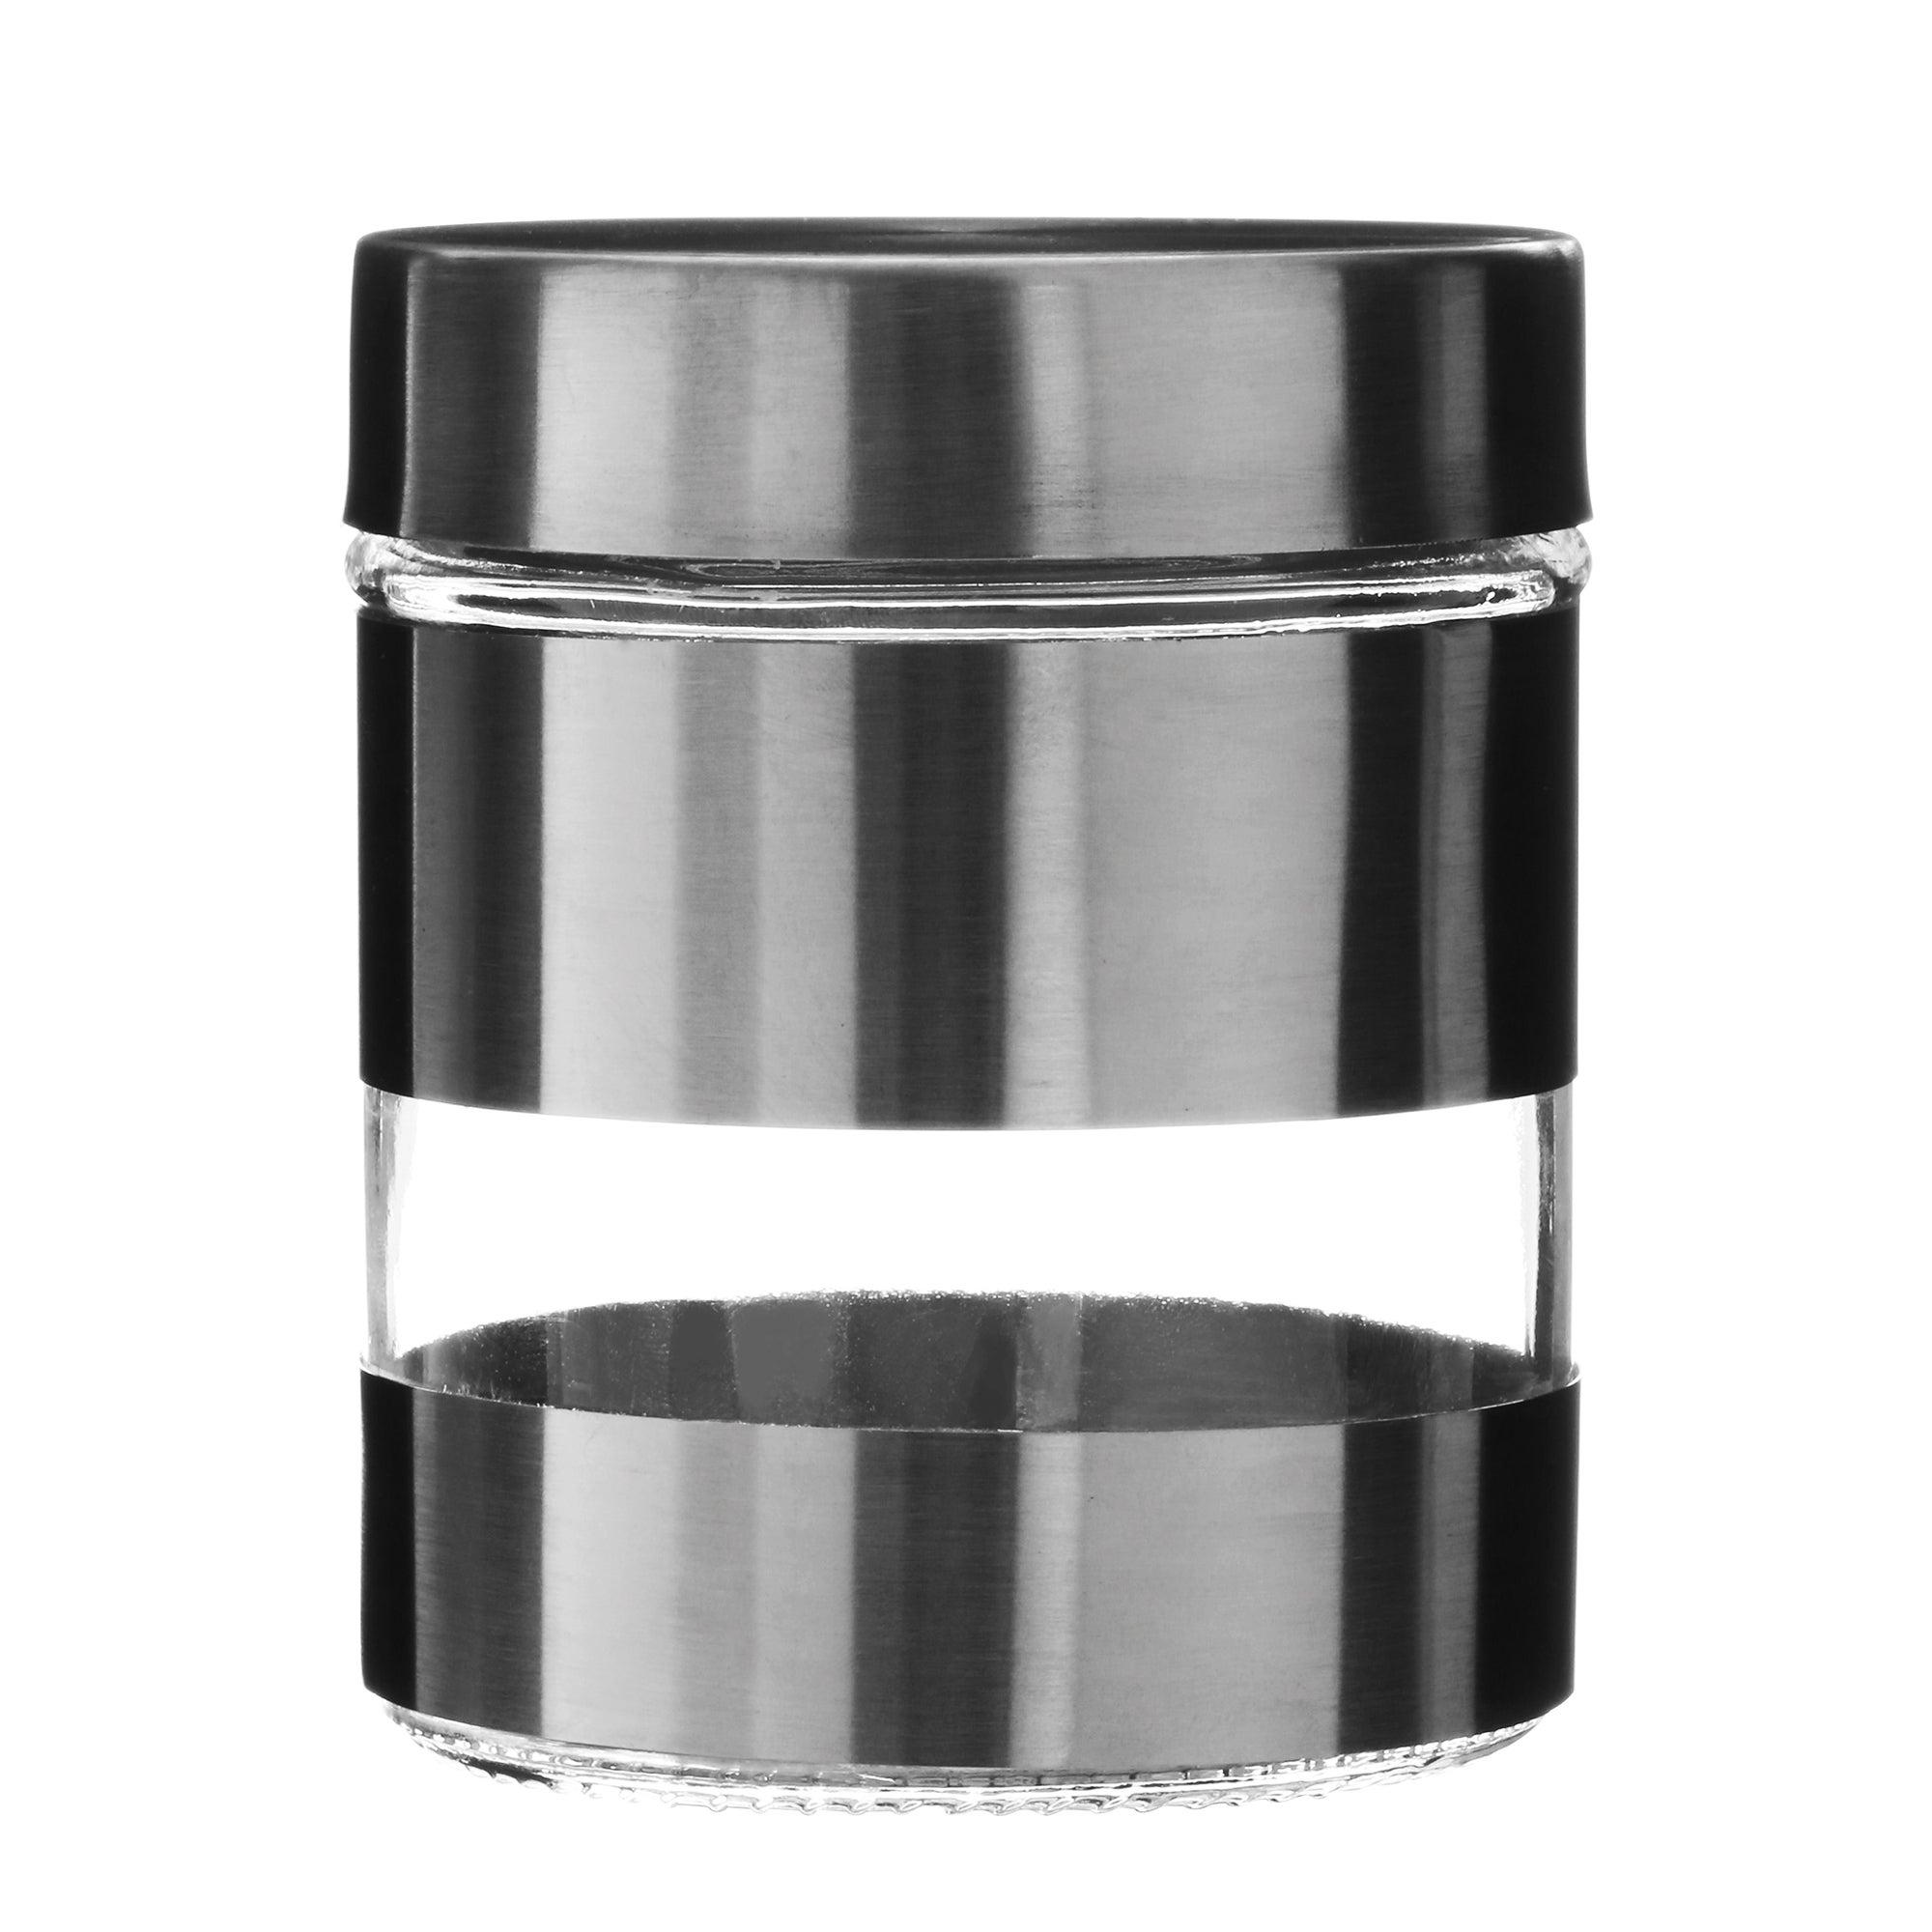 Stainless Steel Storage Jar